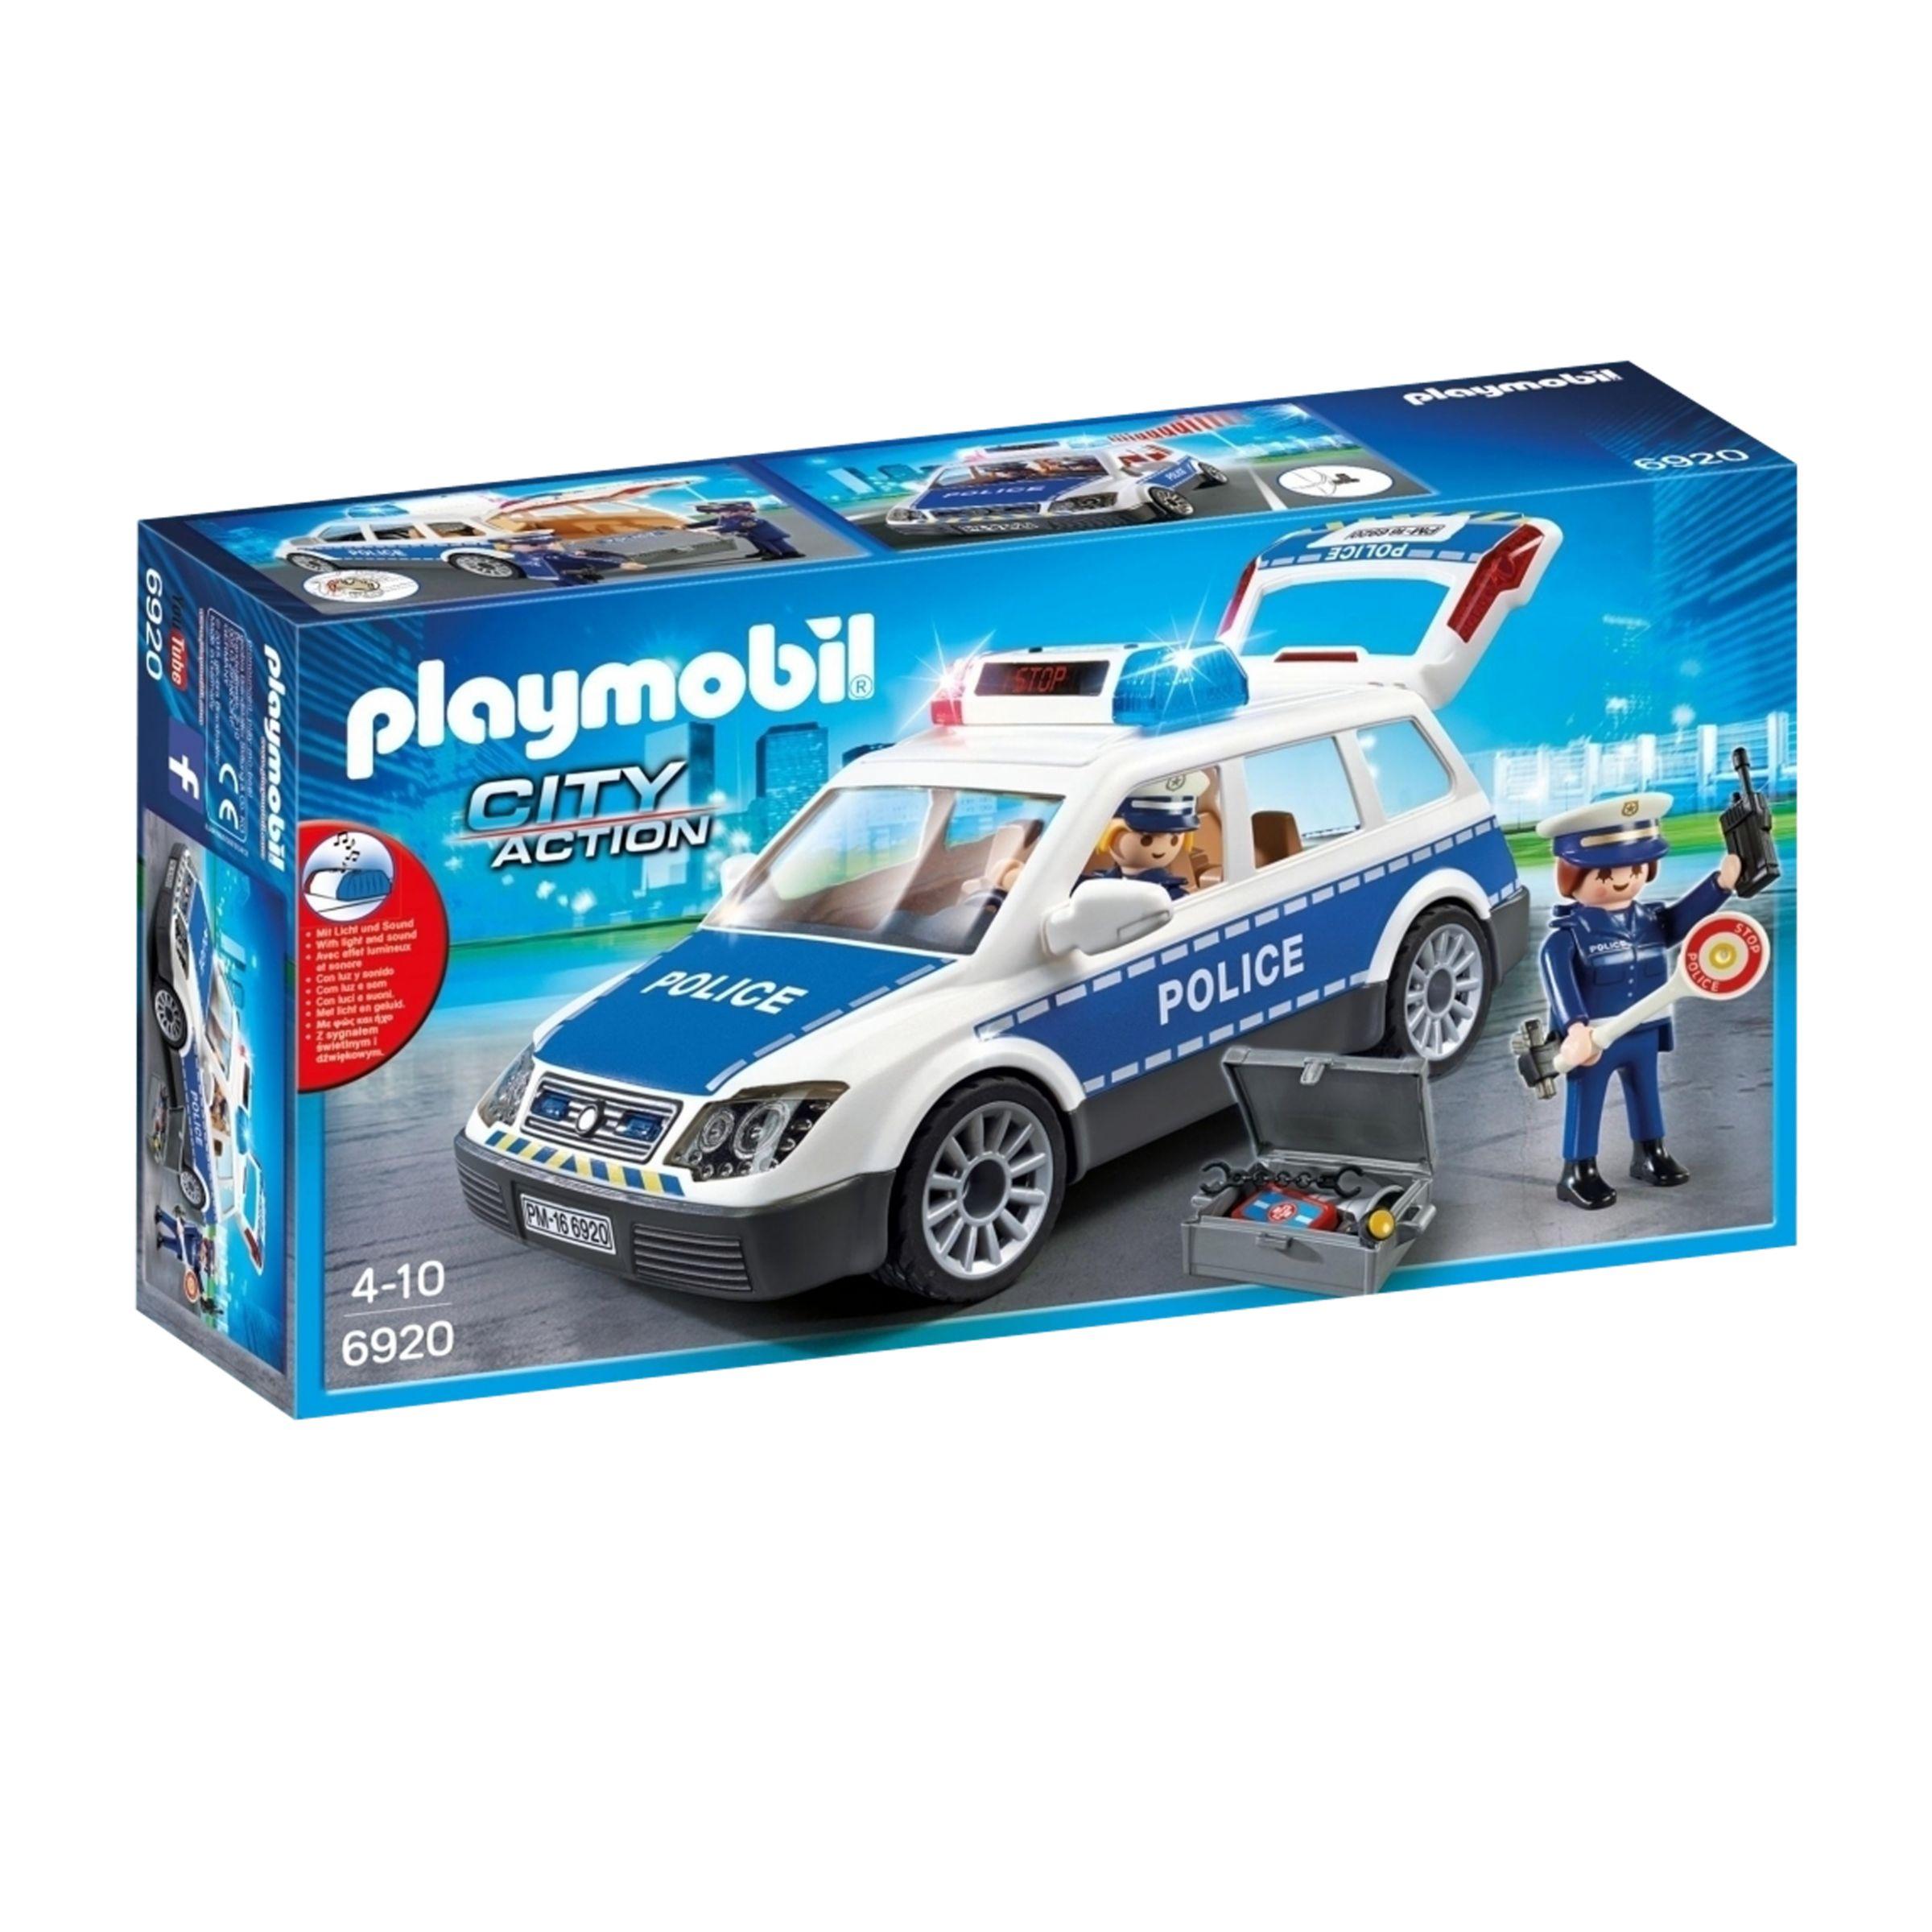 PLAYMOBIL Playmobil City Action Police Squad Car